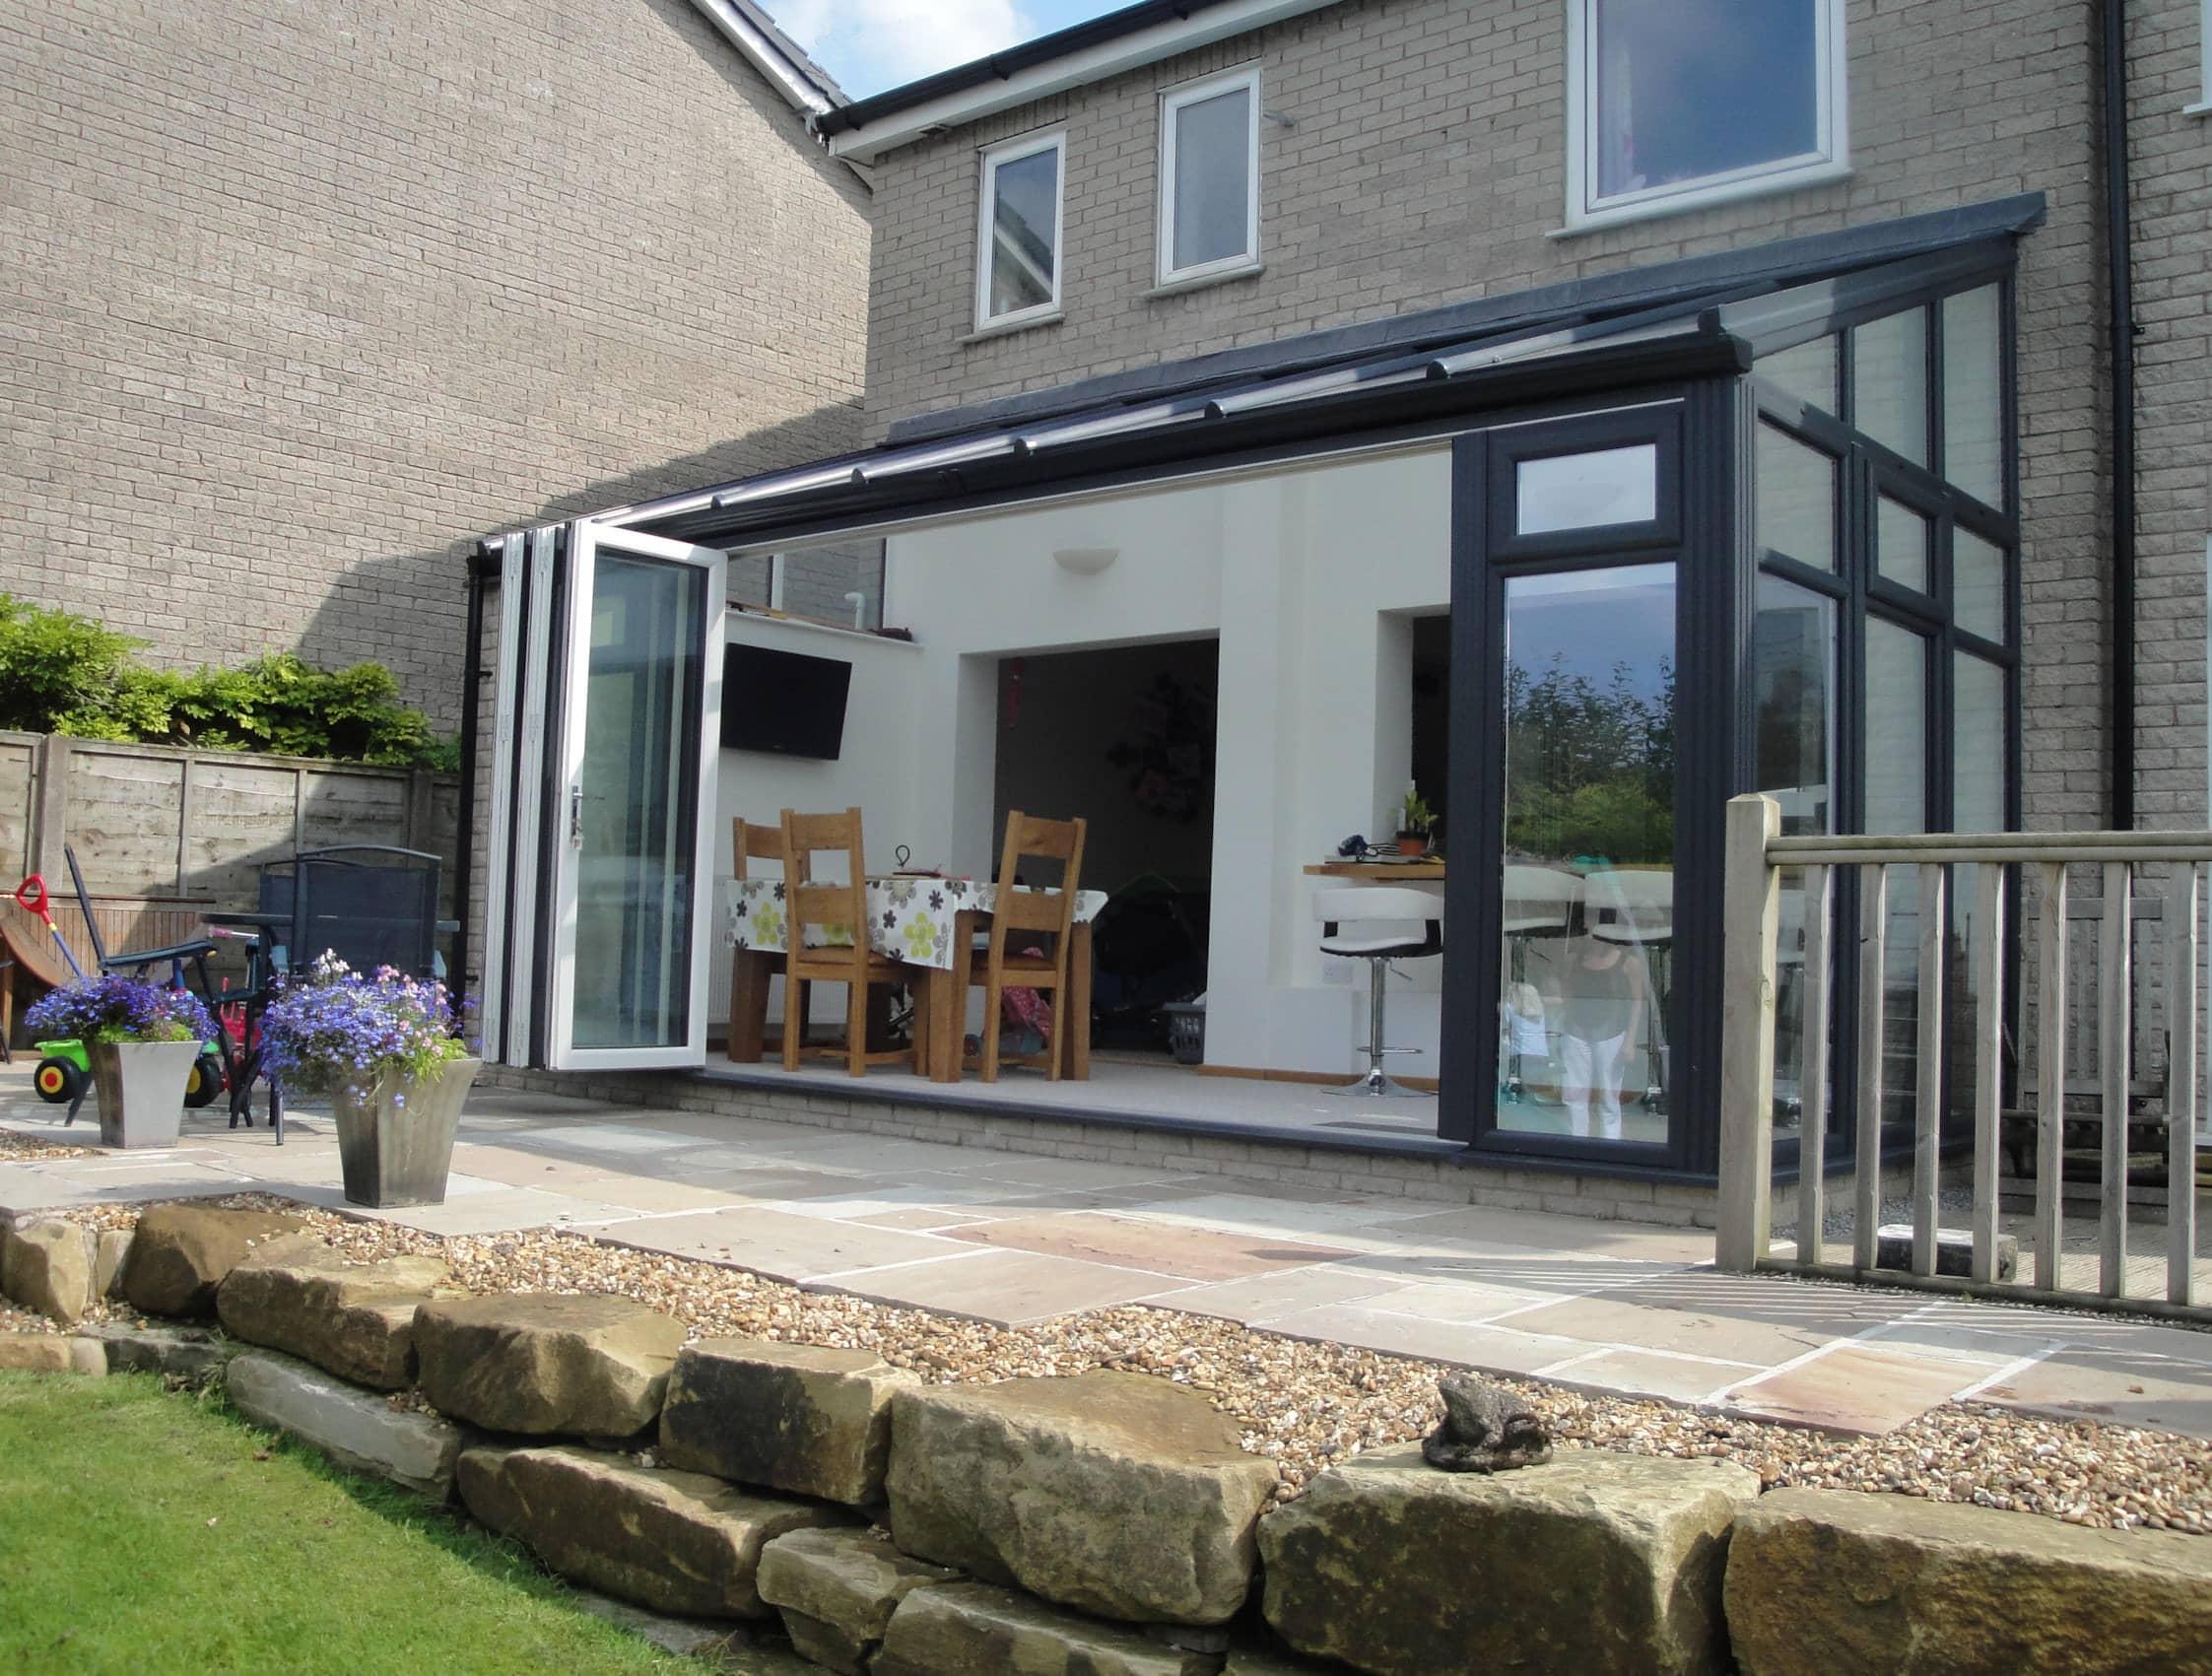 exterior view black and white folding doors custom sunroom nj custom sunroom builder Gambrick tile patio real stone